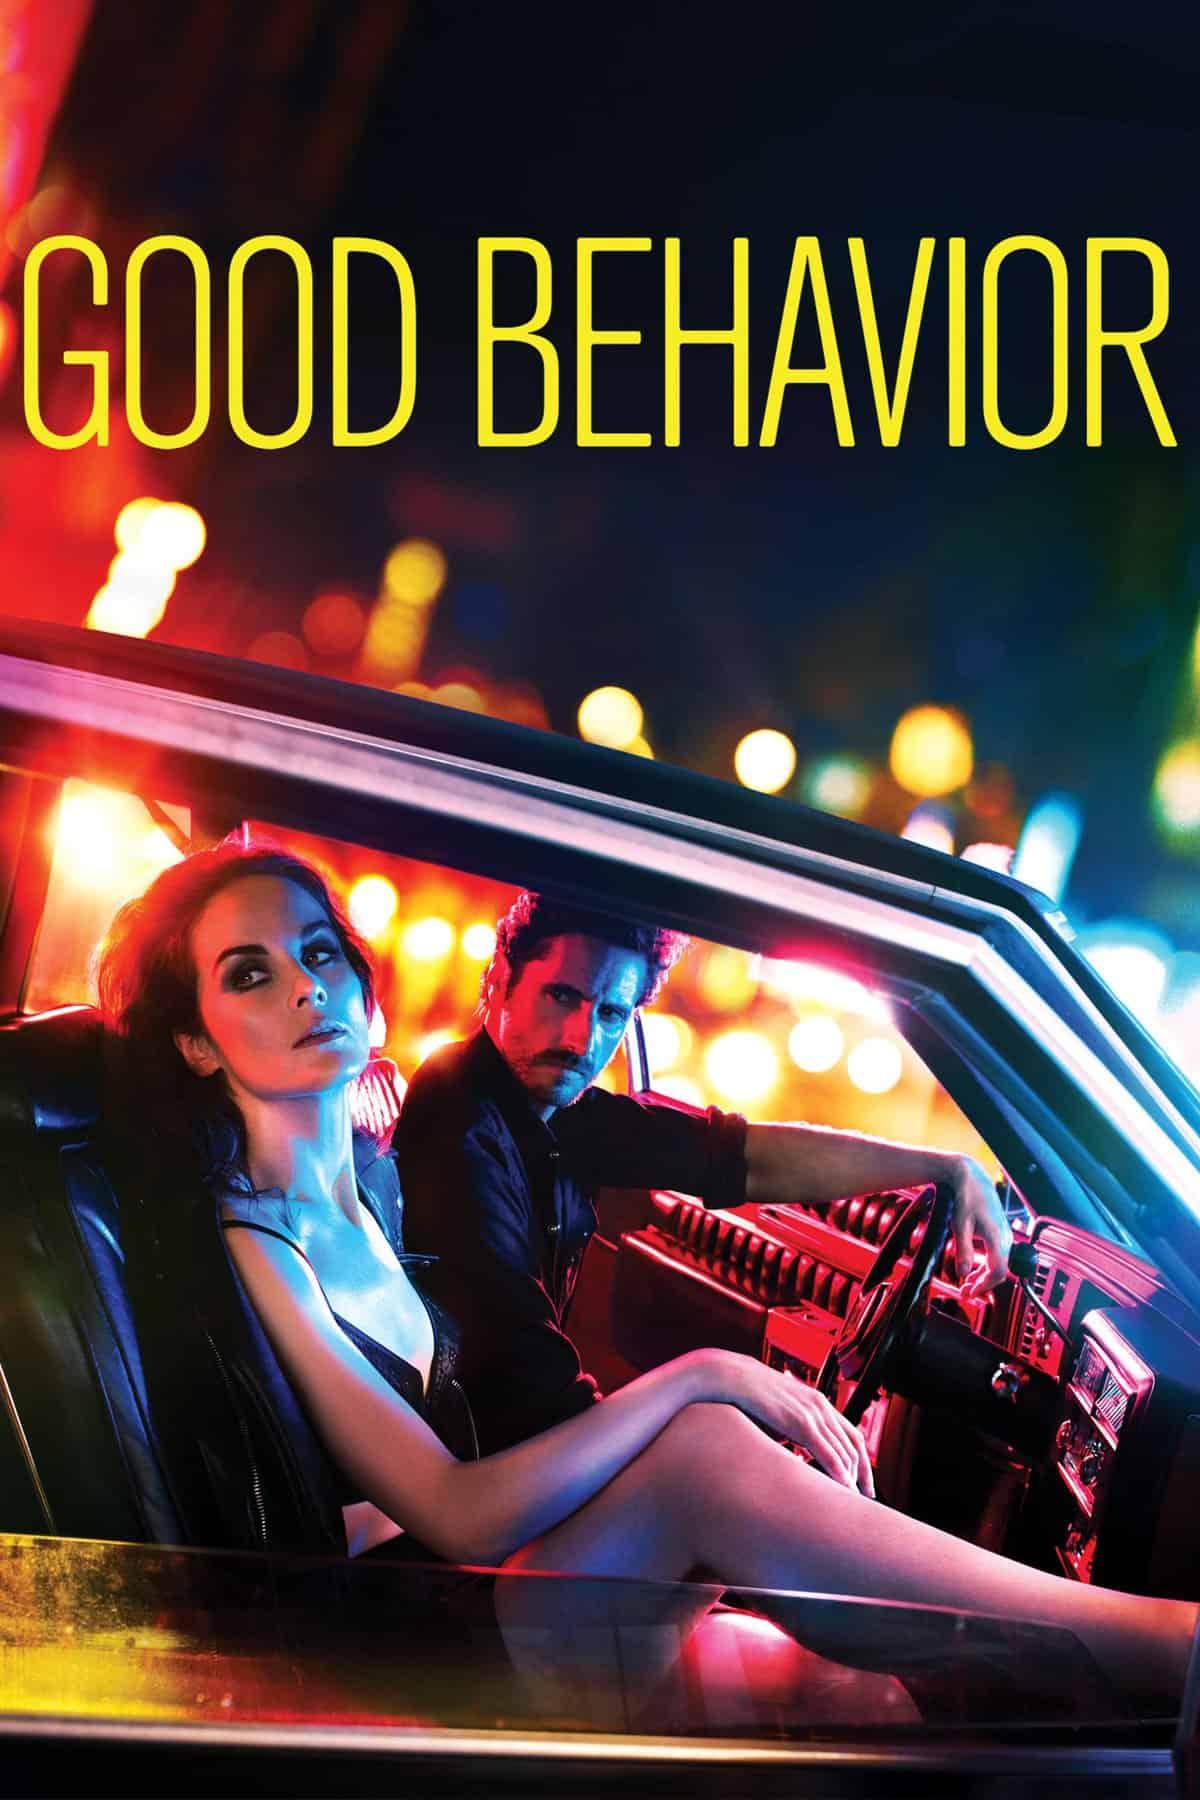 Good Behavior, 2008